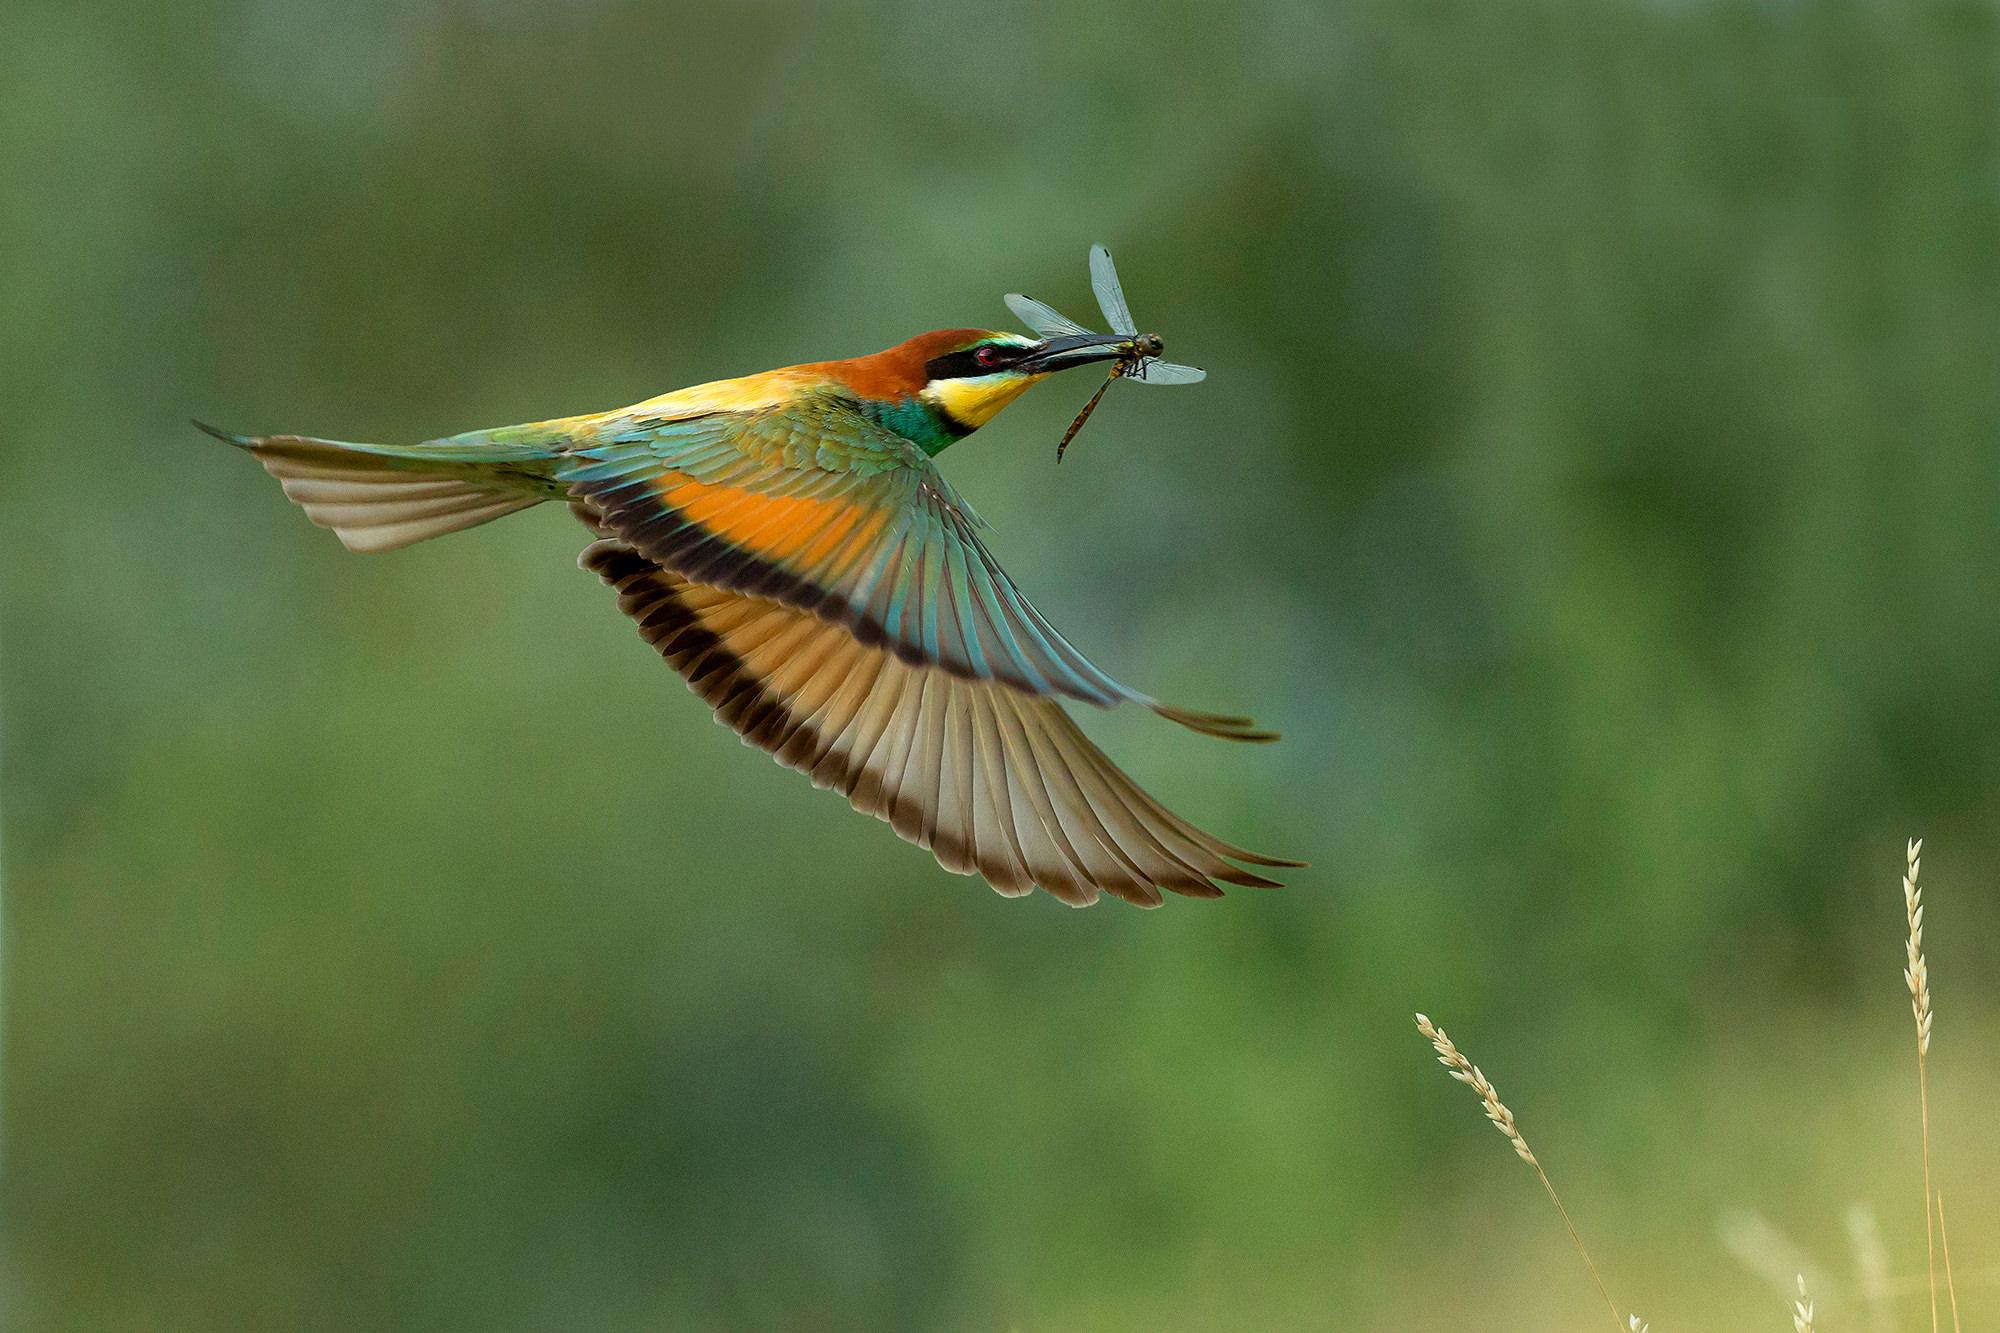 Gyurgyalag, European Bee-eater, Bienenfresser, Merops apiaster